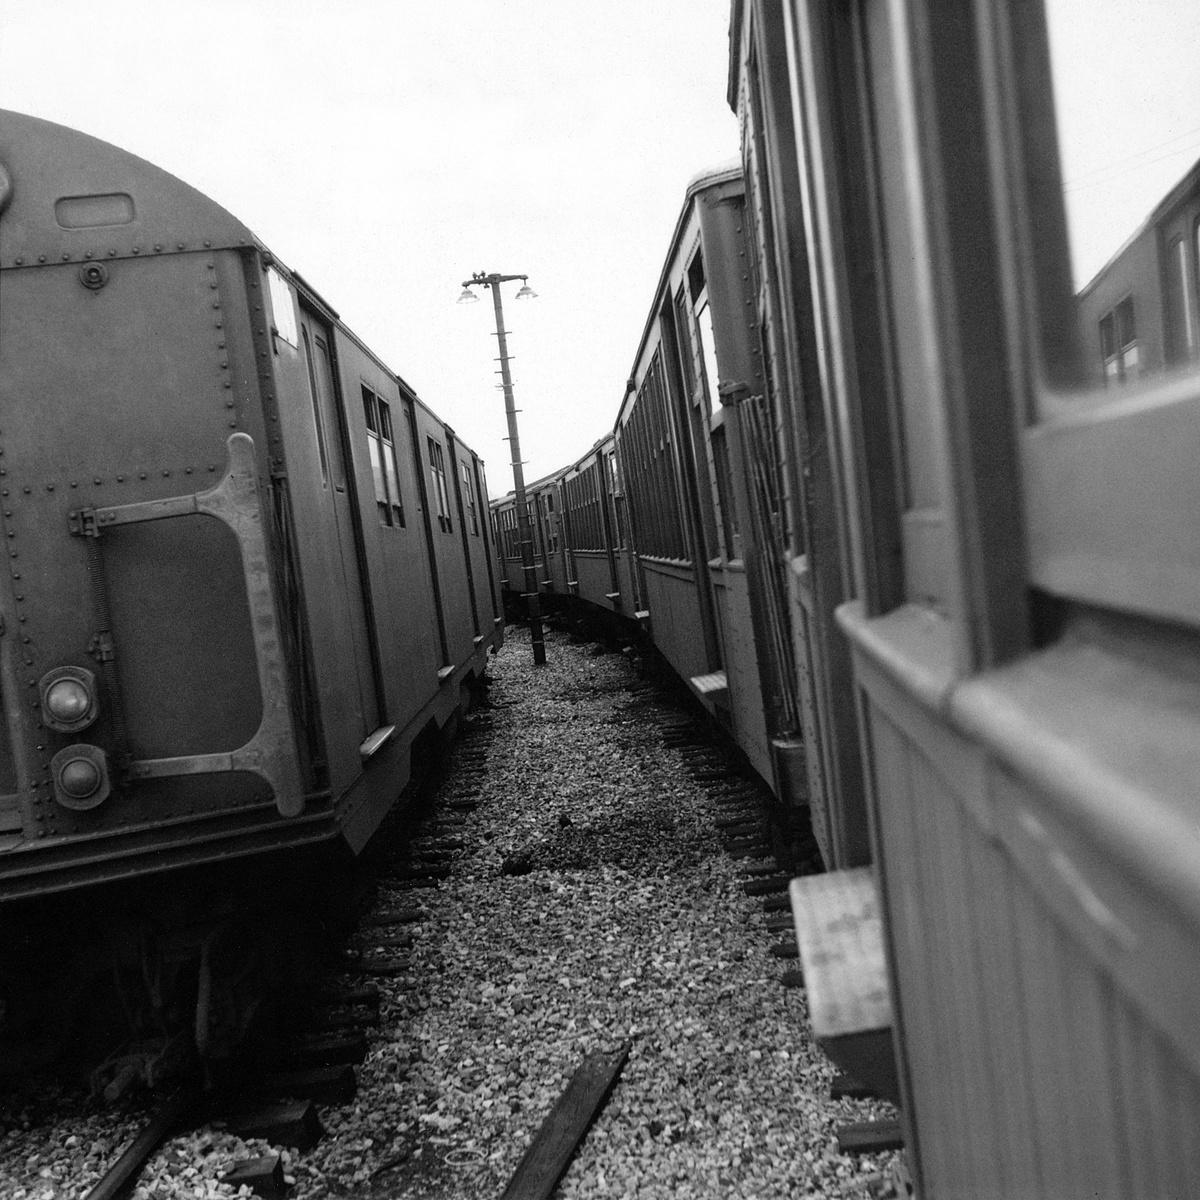 (528k, 1200x1200)<br><b>Country:</b> United States<br><b>City:</b> New York<br><b>System:</b> New York City Transit<br><b>Location:</b> Coney Island Yard<br><b>Route:</b> Fan Trip<br><b>Car:</b> BMT Q  <br><b>Collection of:</b> David Pirmann<br><b>Date:</b> 4/19/1964<br><b>Notes:</b> With R27/30 train<br><b>Viewed (this week/total):</b> 0 / 851